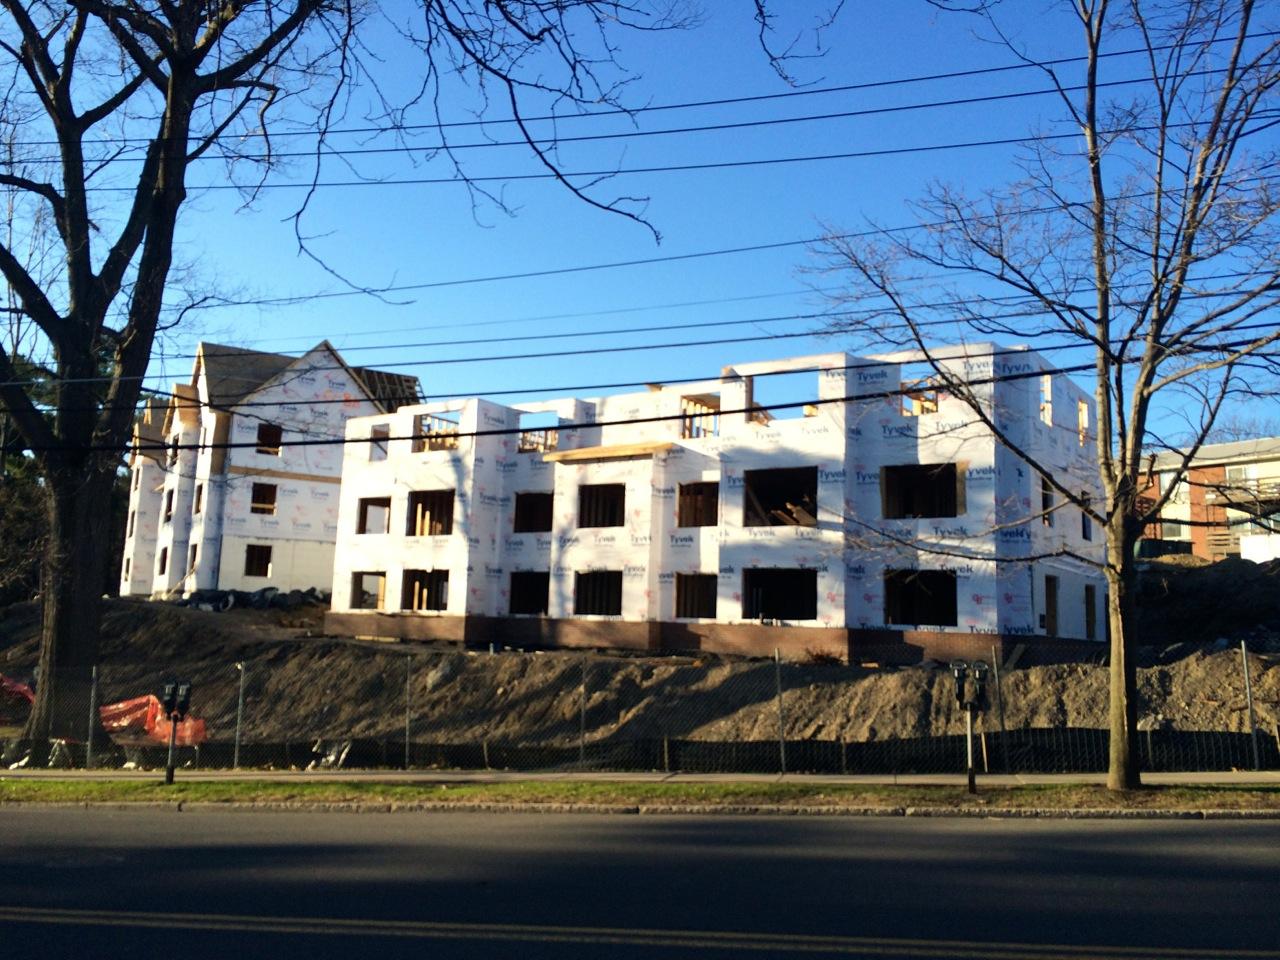 Thurston-Ave-Apartments-Ithaca-04241409